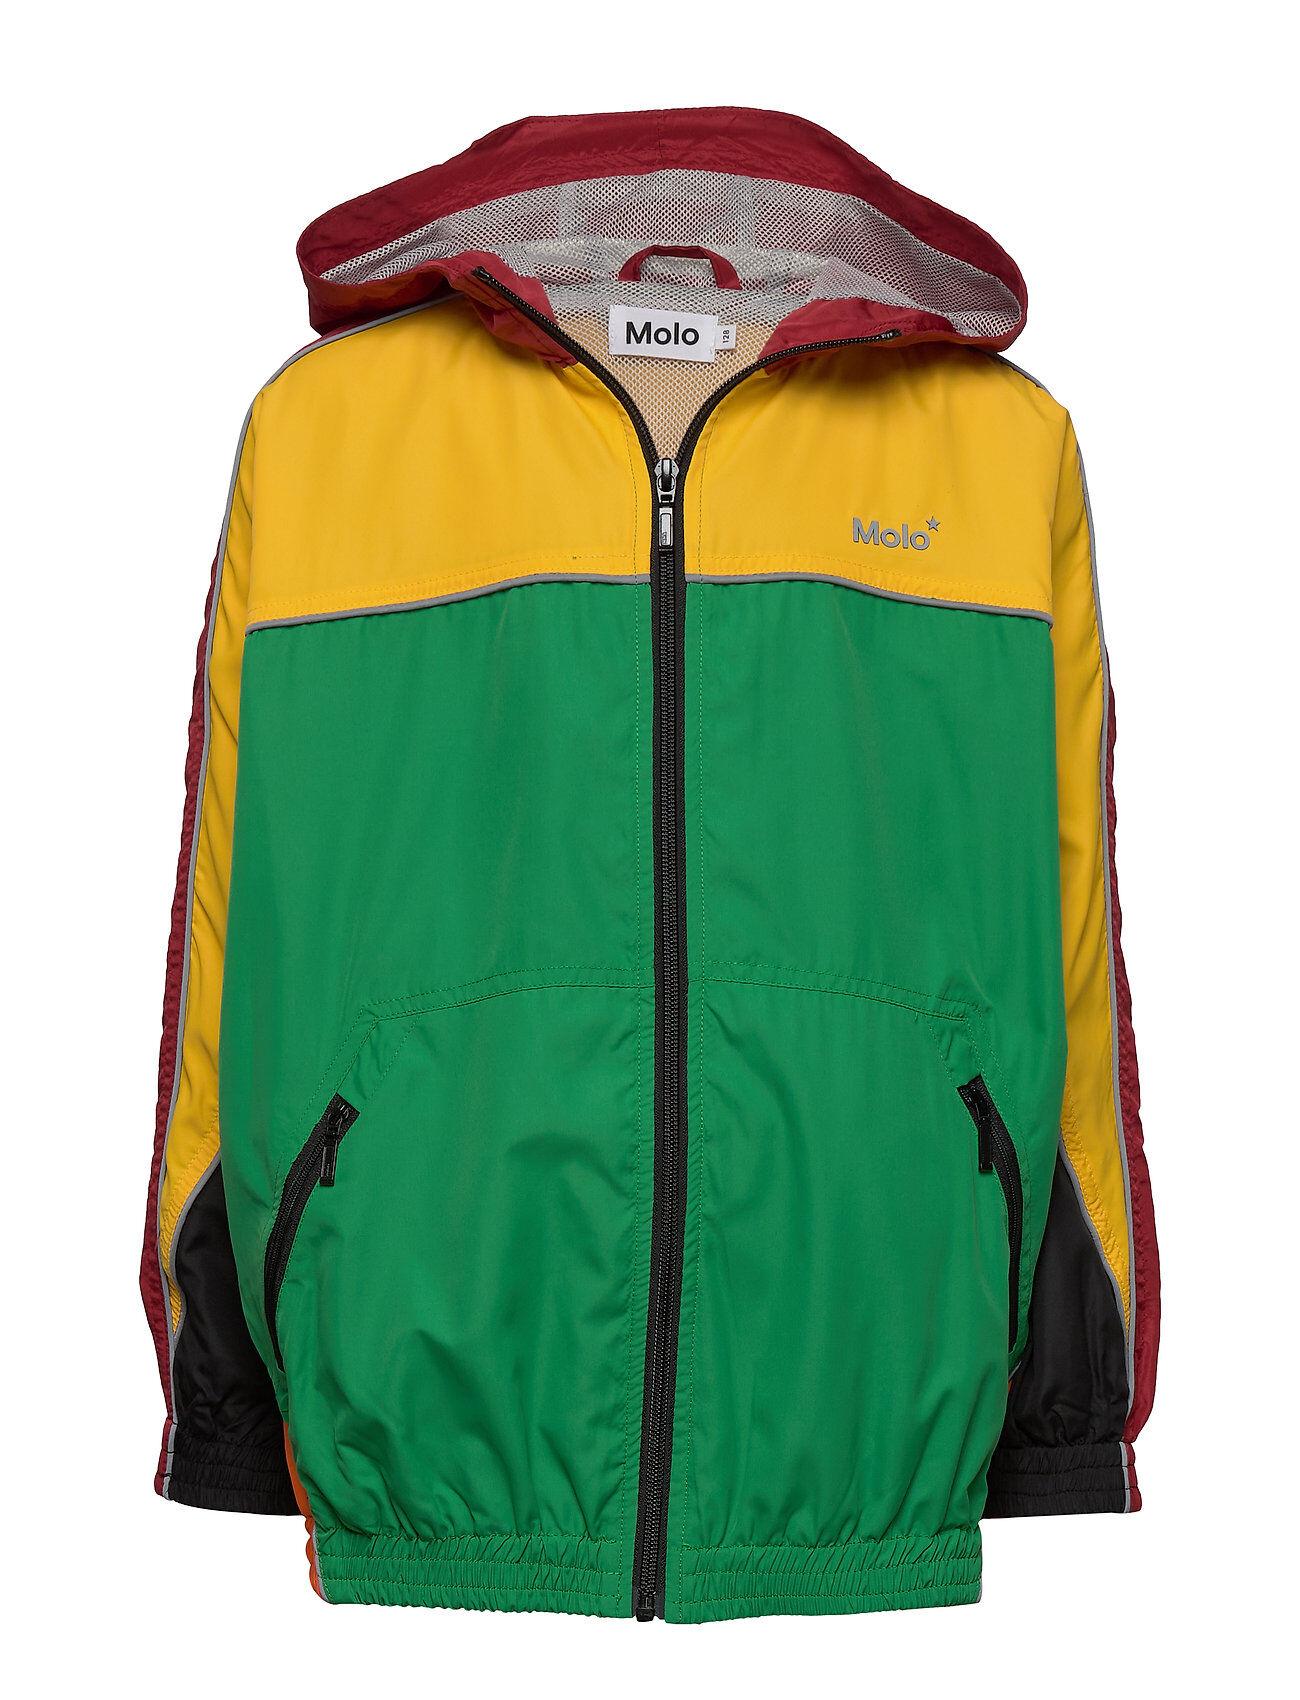 Molo Miirto Outerwear Jackets & Coats Windbreaker Vihreä Molo